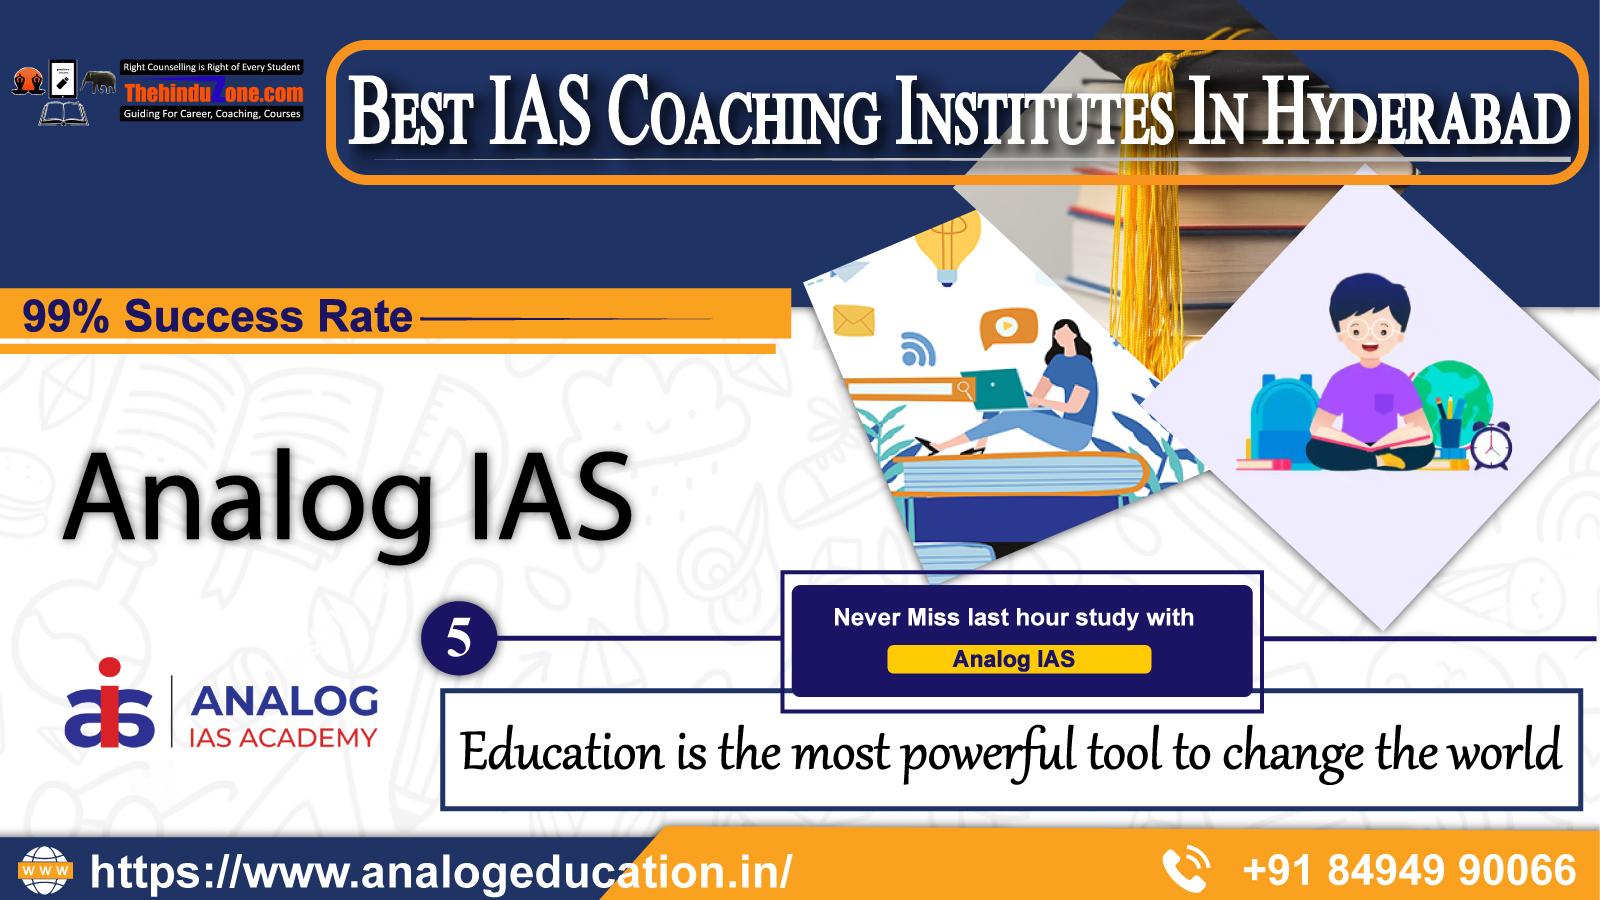 Analog IAS Academy In Hyderabad